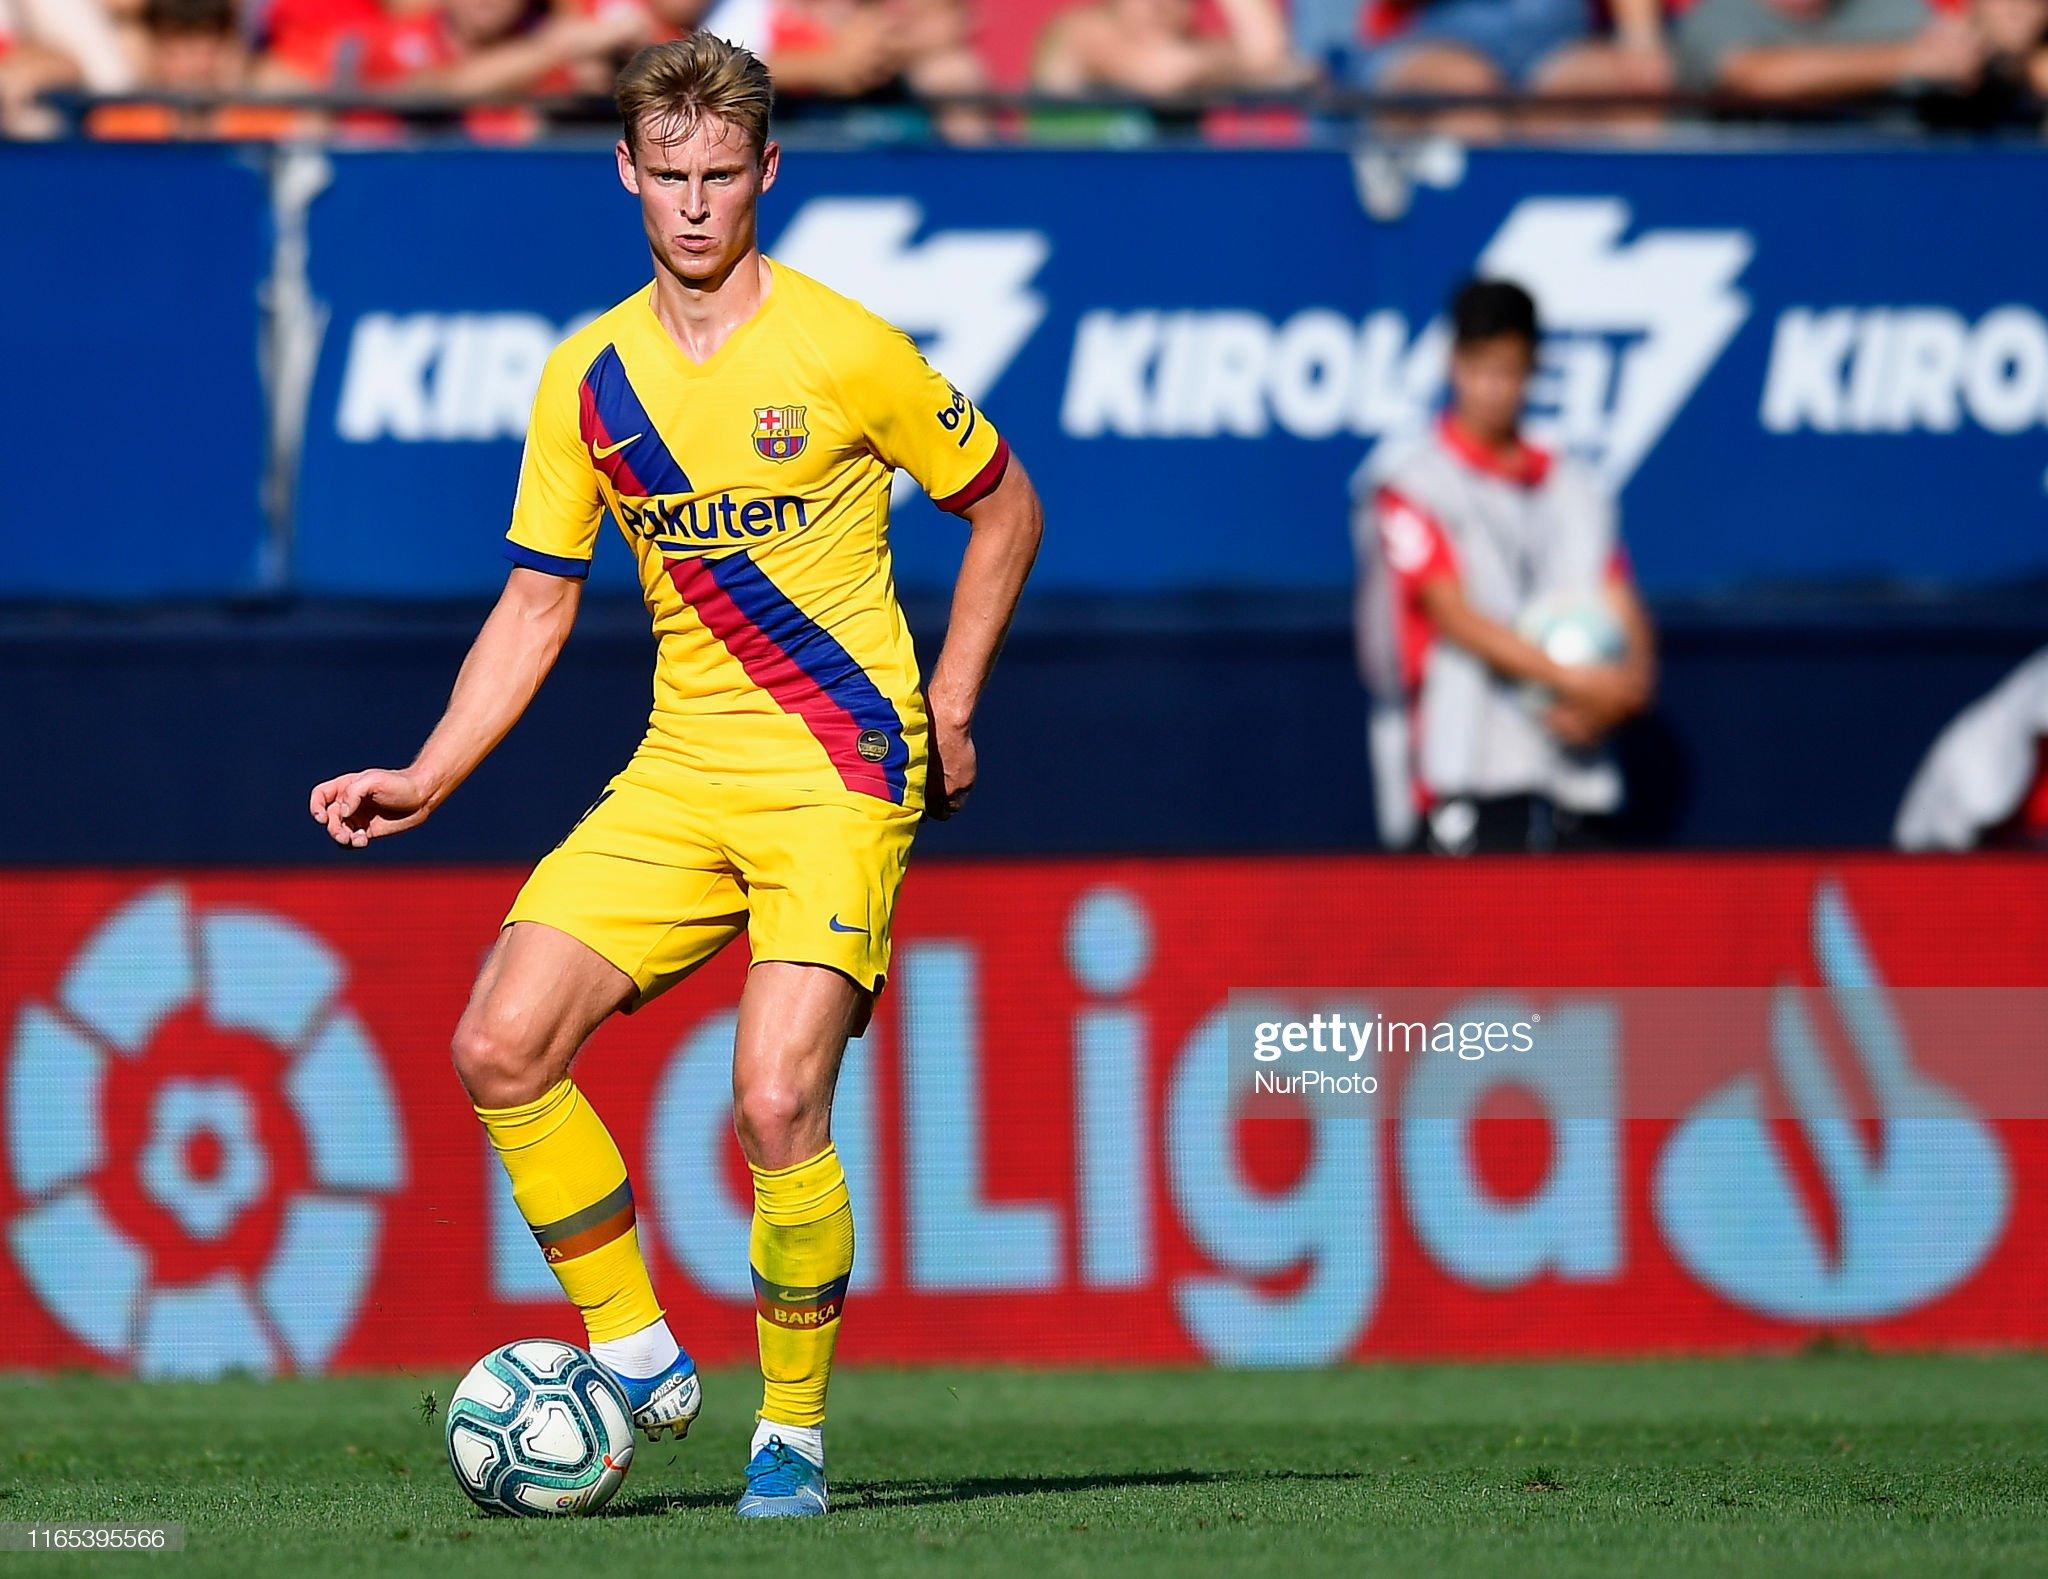 صور مباراة : أوساسونا - برشلونة 2-2 ( 31-08-2019 )  Frenkie-de-jong-of-barcelona-in-action-during-the-liga-match-between-picture-id1165395566?s=2048x2048